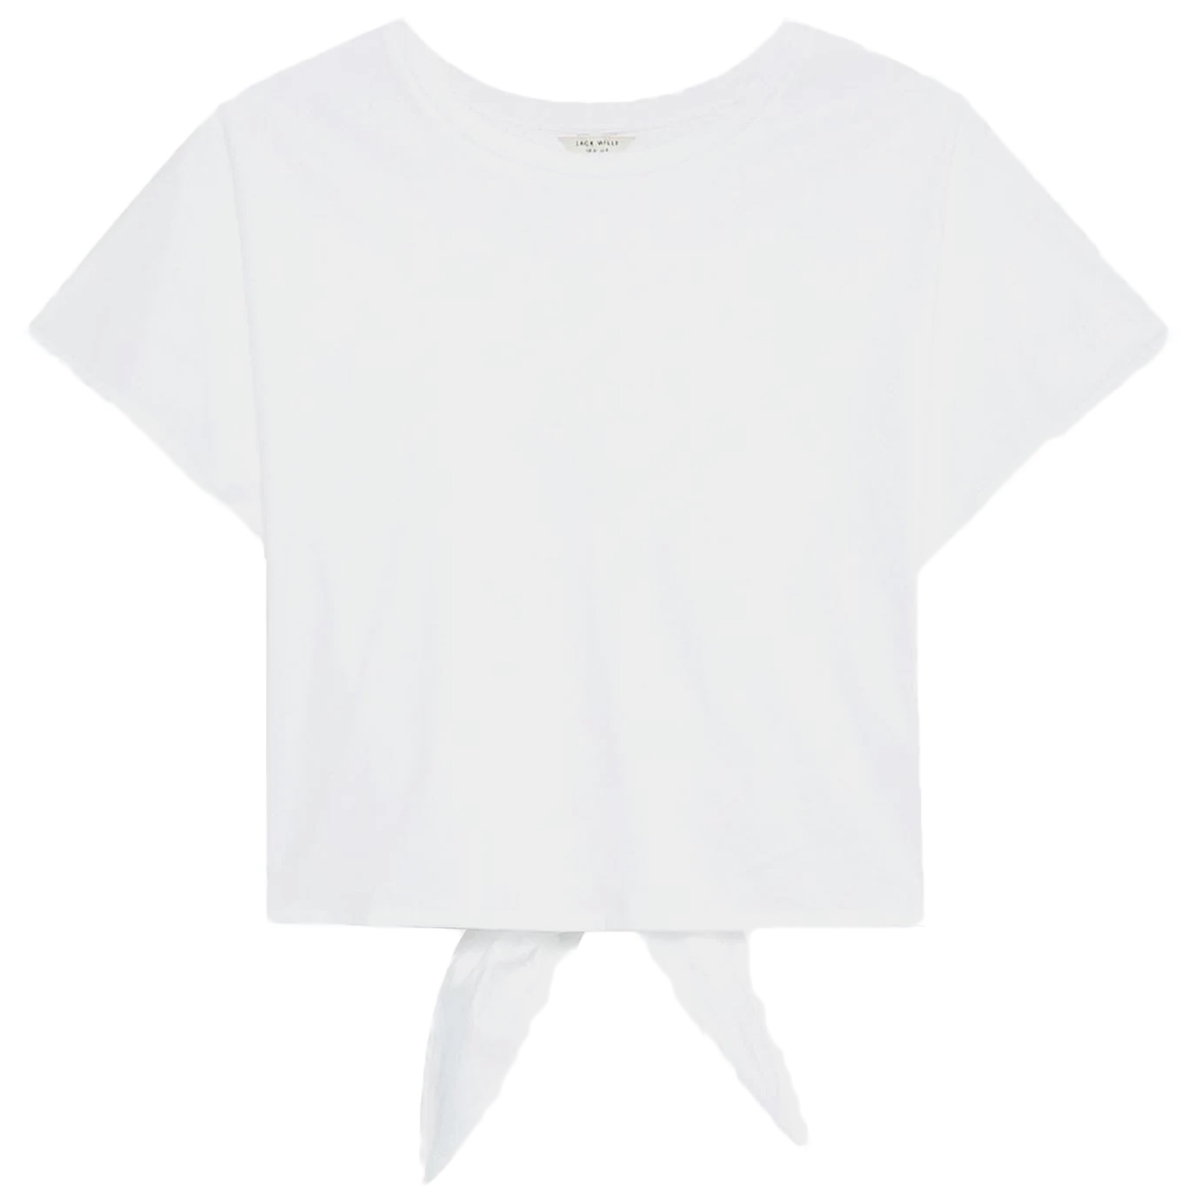 Jack Wills Women's Lorswood Bow Back Tee - White, 12